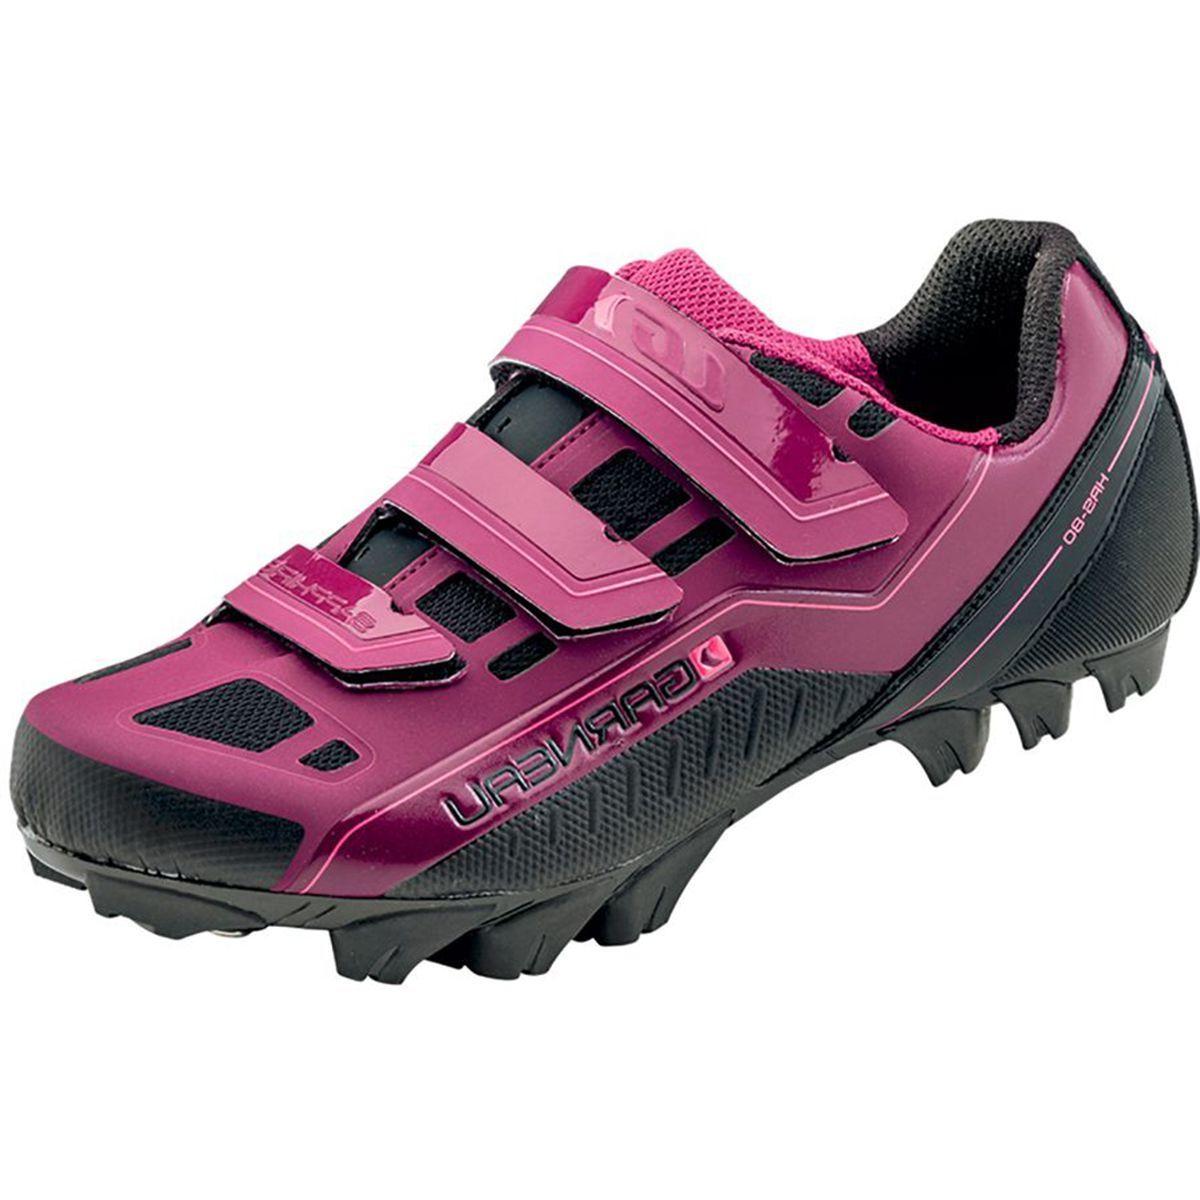 Louis Garneau Sapphire Mountain Shoes - Women's